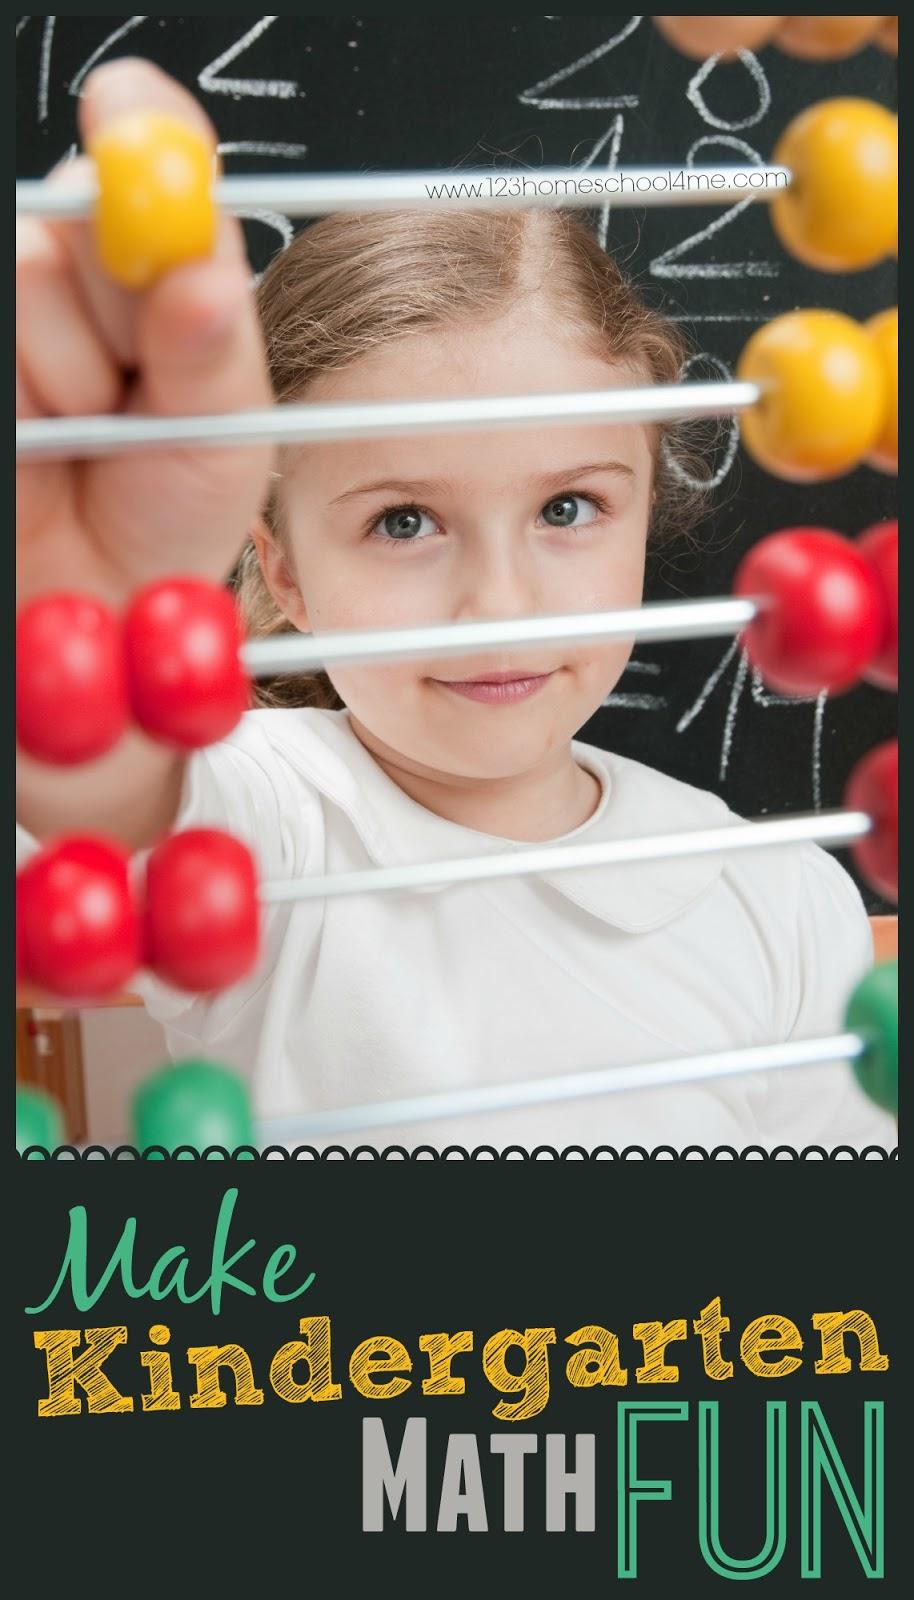 Kinder Garden: Make Kindergarten Math FUN